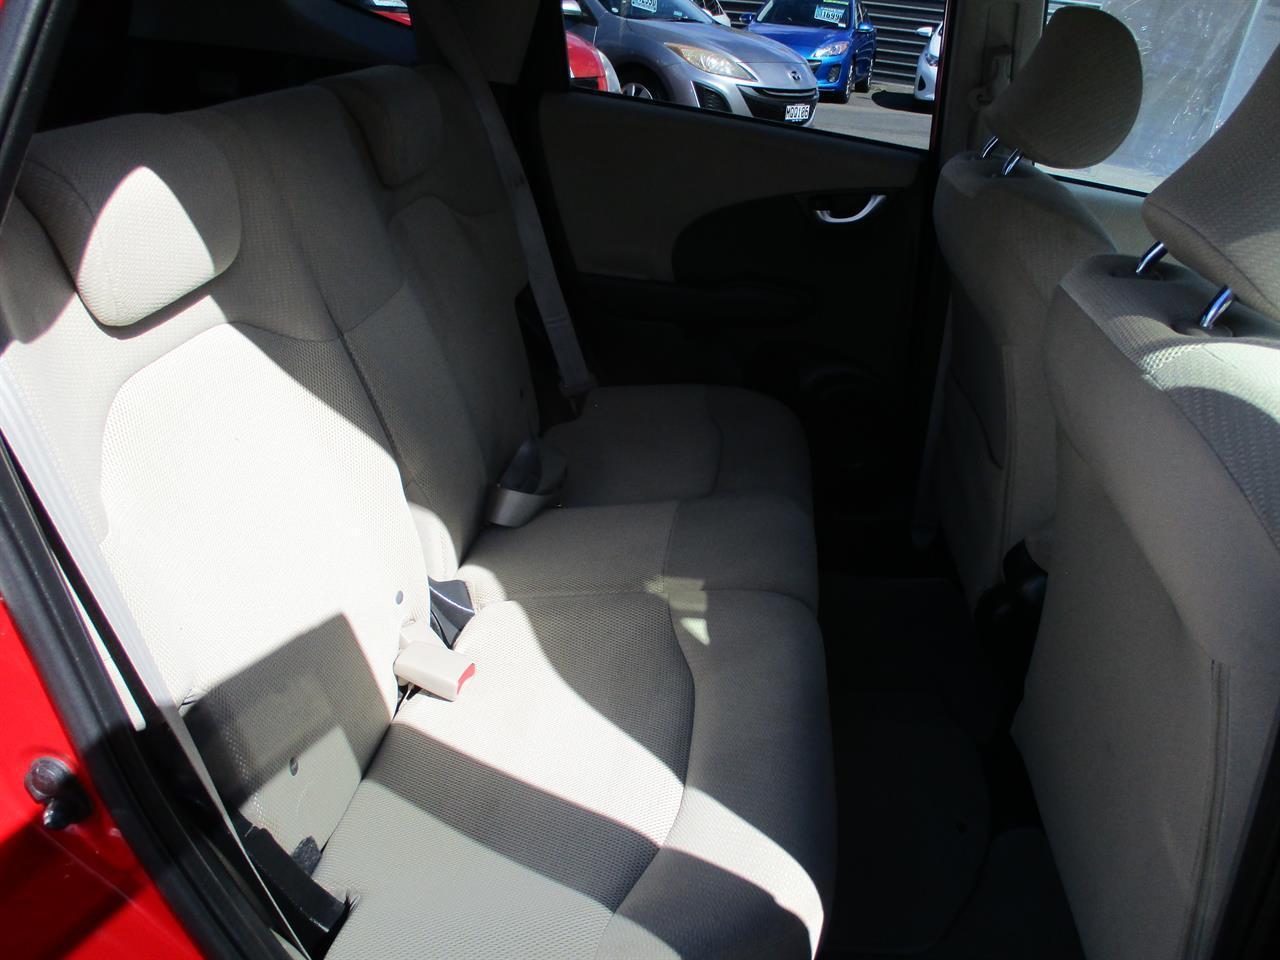 image-13, 2011 Honda Fit Hybrid at Dunedin